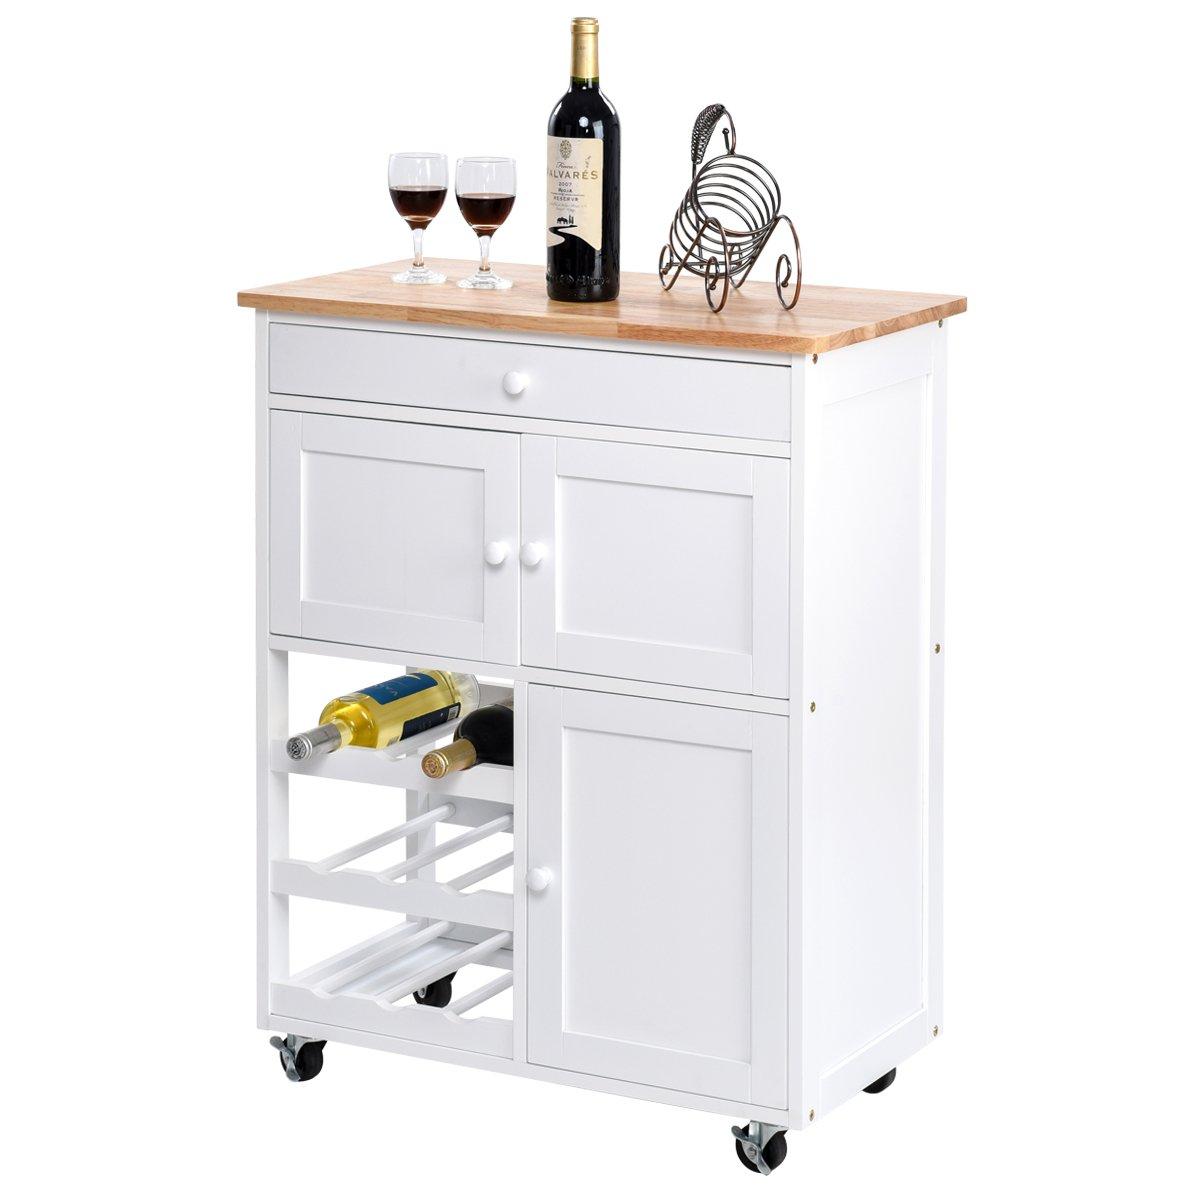 Giantex Modern Rolling Kitchen Trolley Cart w/Drawer & Wine Rack Storage Cabinet Home Restaurant Island Serving Cart w/Wheels (White) by Giantex